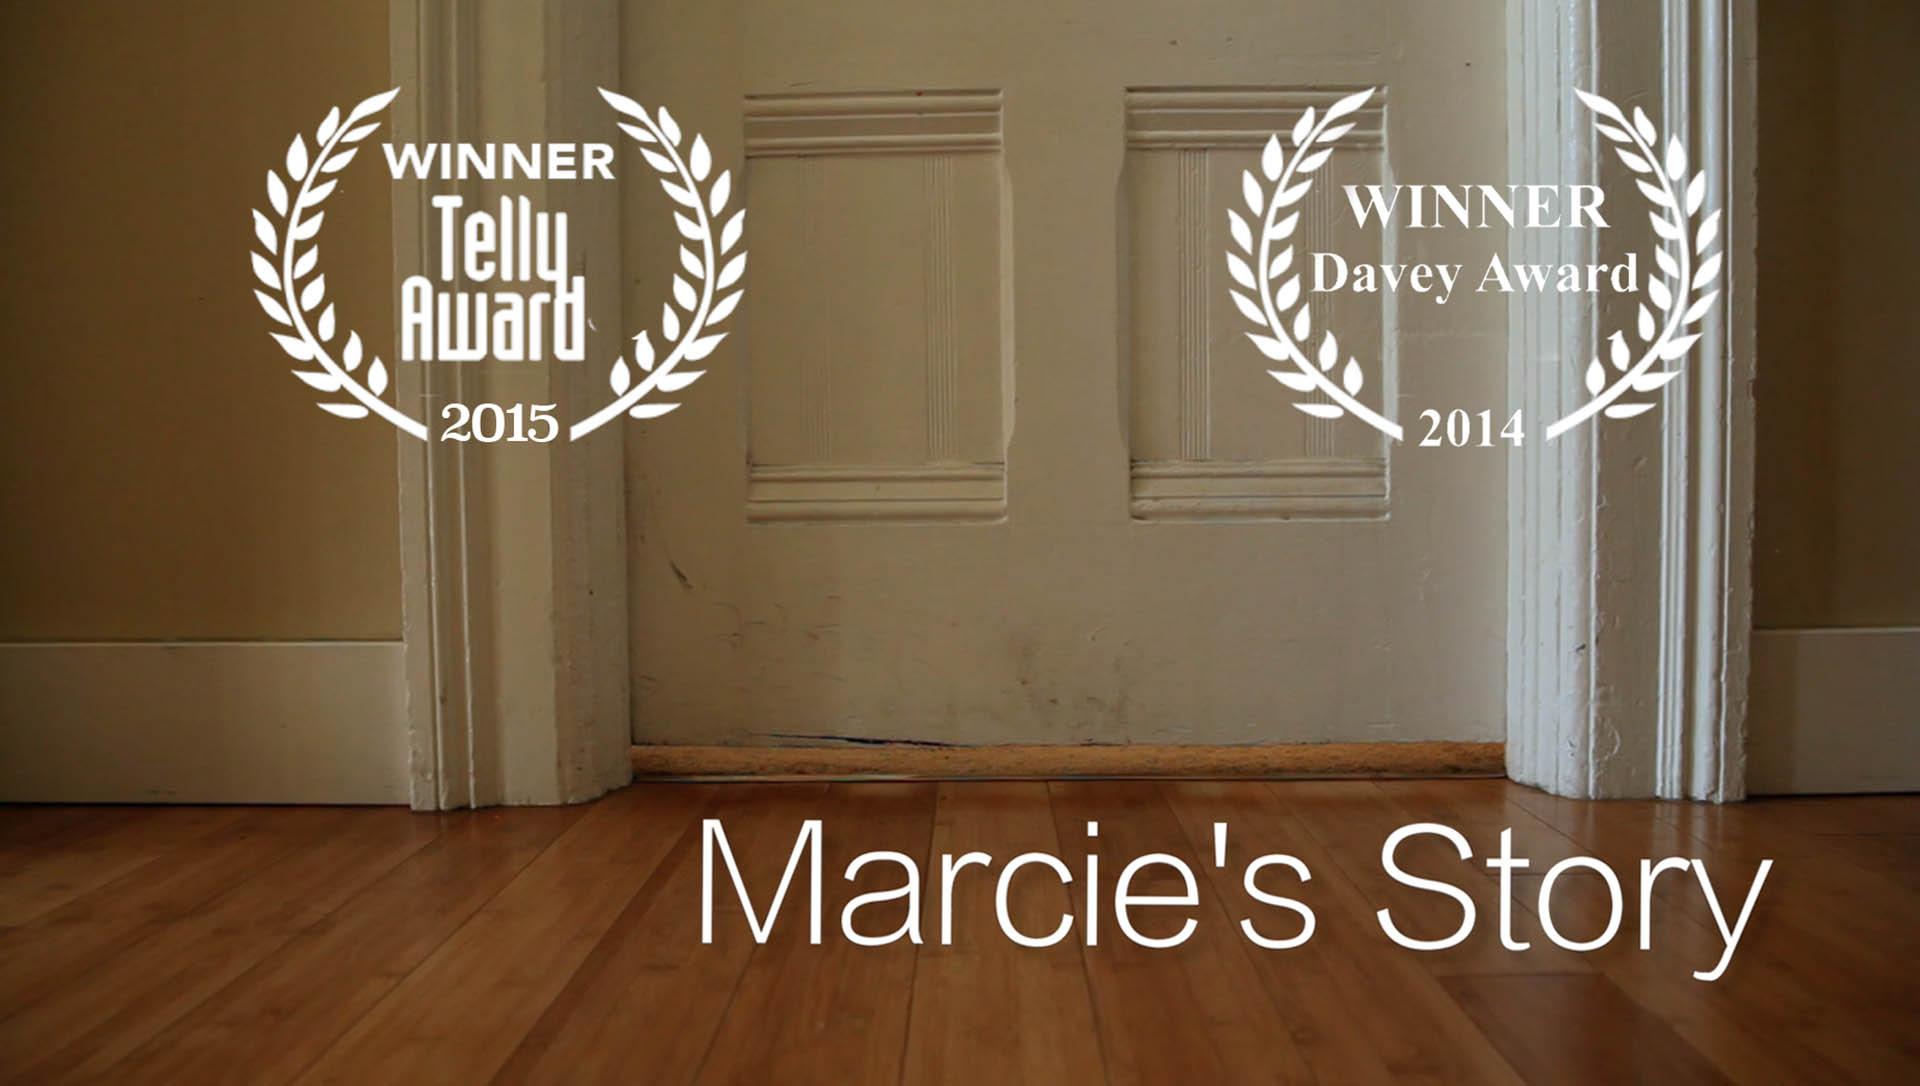 Marcie's Story – Alameda Health System